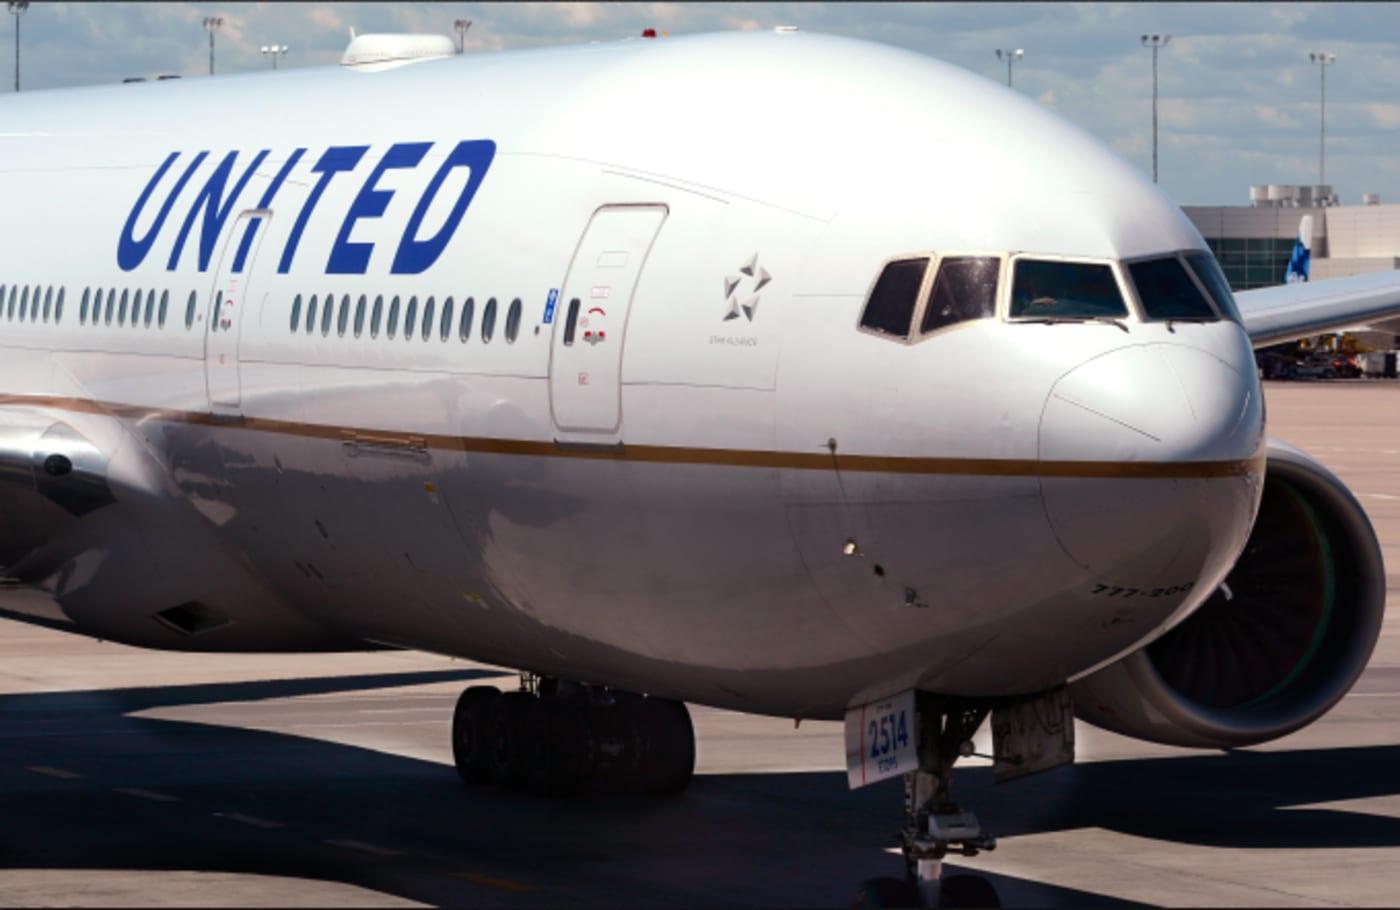 United Airlines passenger plane